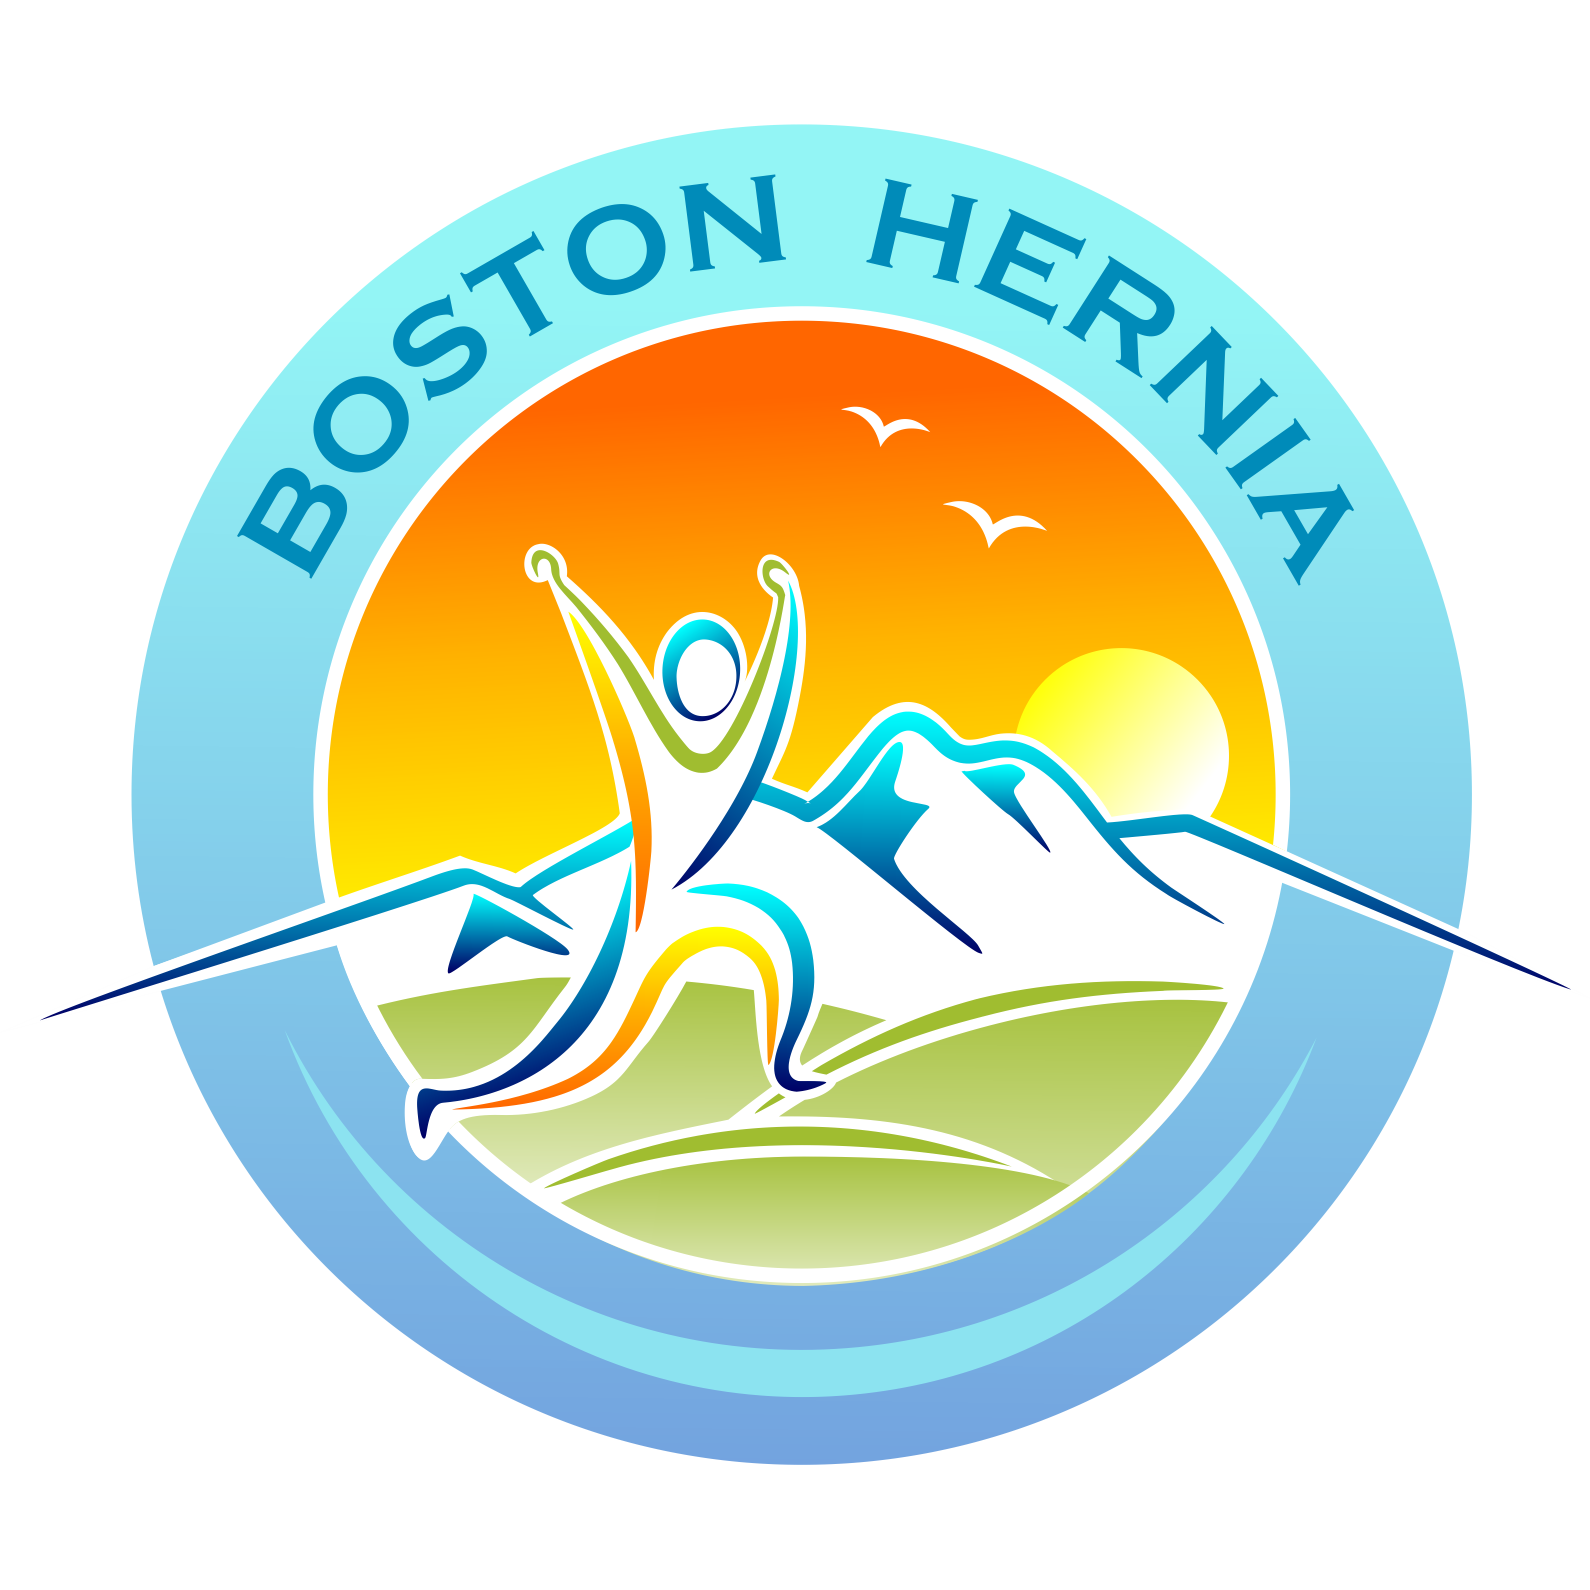 Boston Hernia - Michael Reinhorn MD FACS